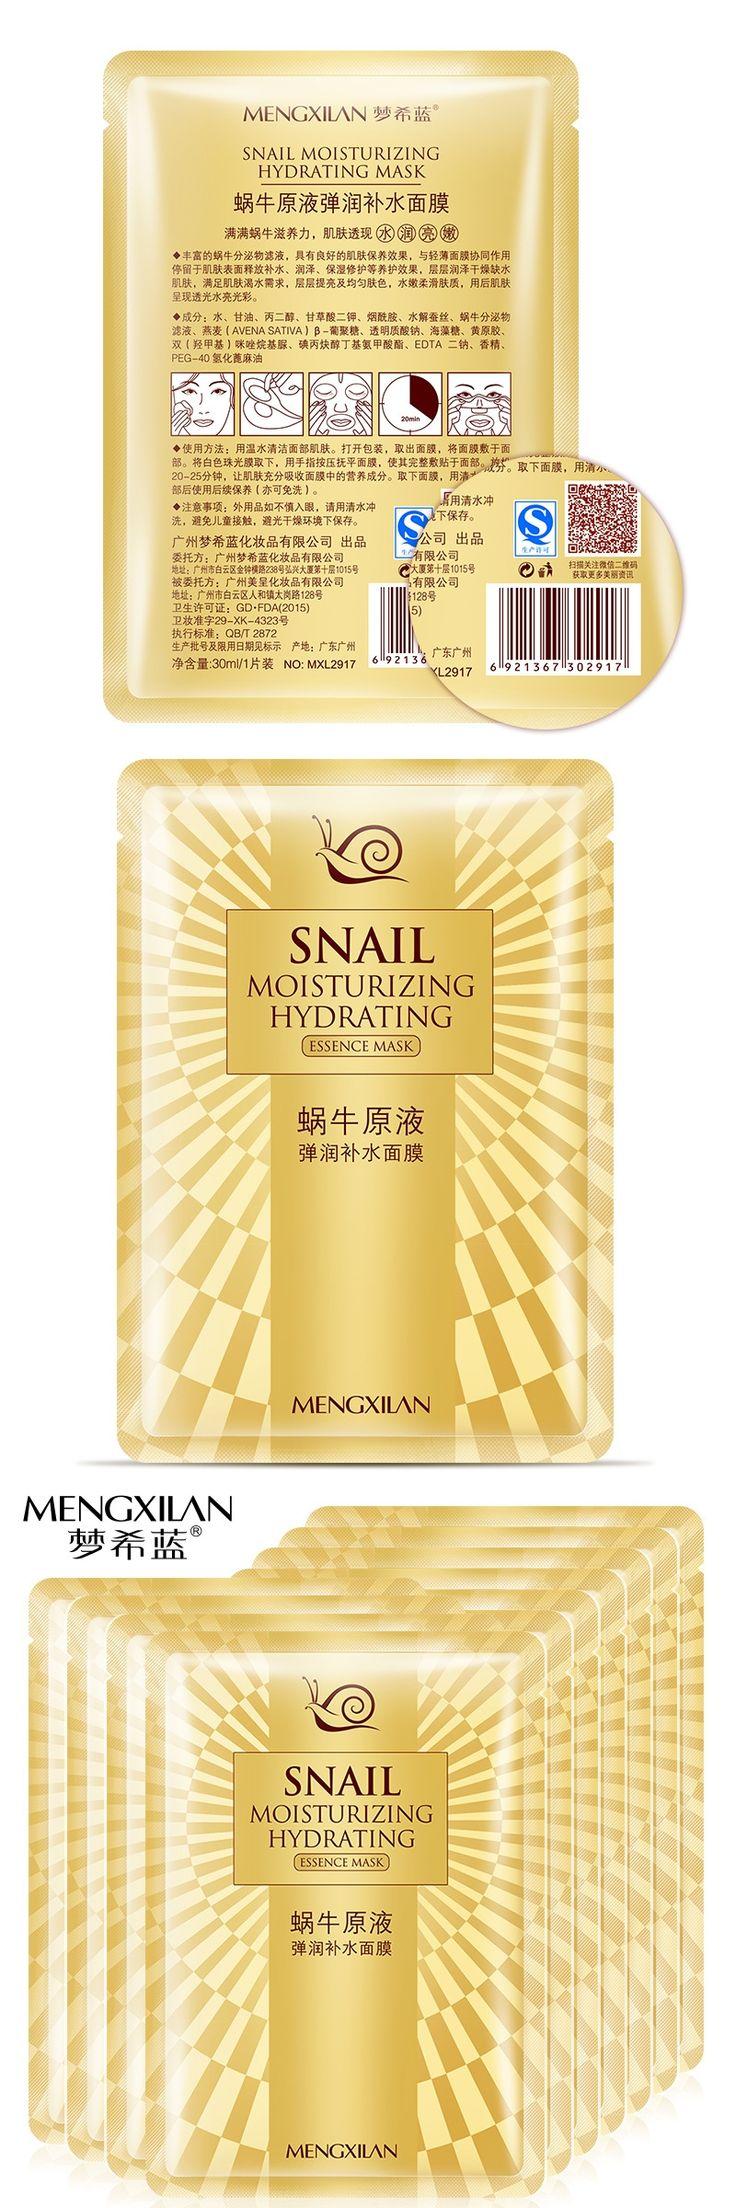 MENGXILAN Snail White Face Mask Moisturizing Anti-Aging Acne Anti Wrinkle Hyaluronic acid Facial Mask 2017 Hot Skin Care 10Pcs